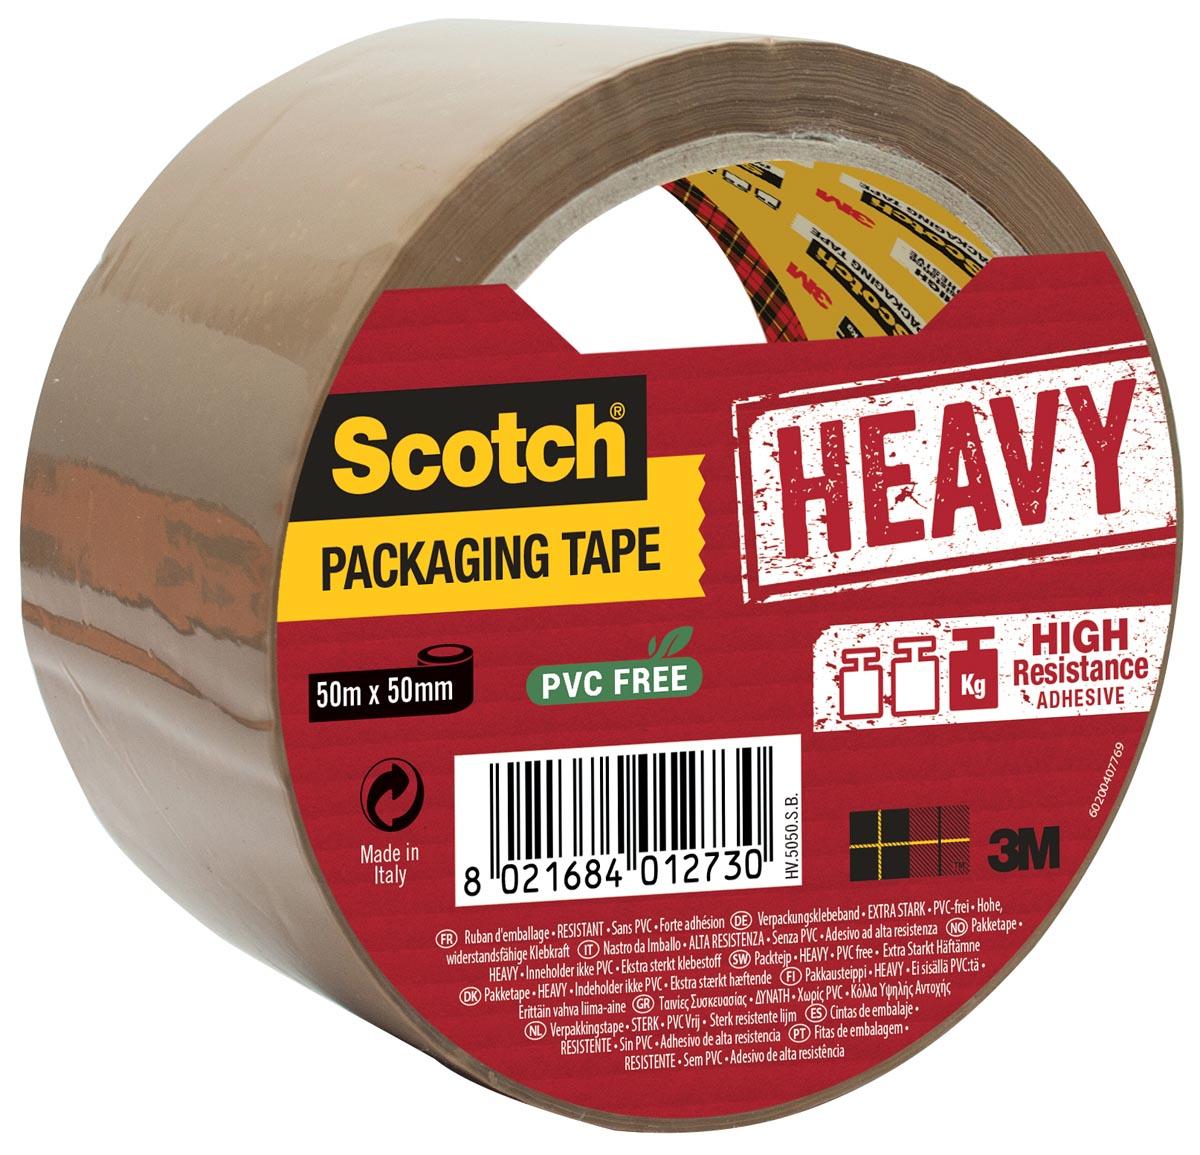 Scotch verpakkingsplakband Heavy, ft 50 mm x 50 m, bruin, per stuk